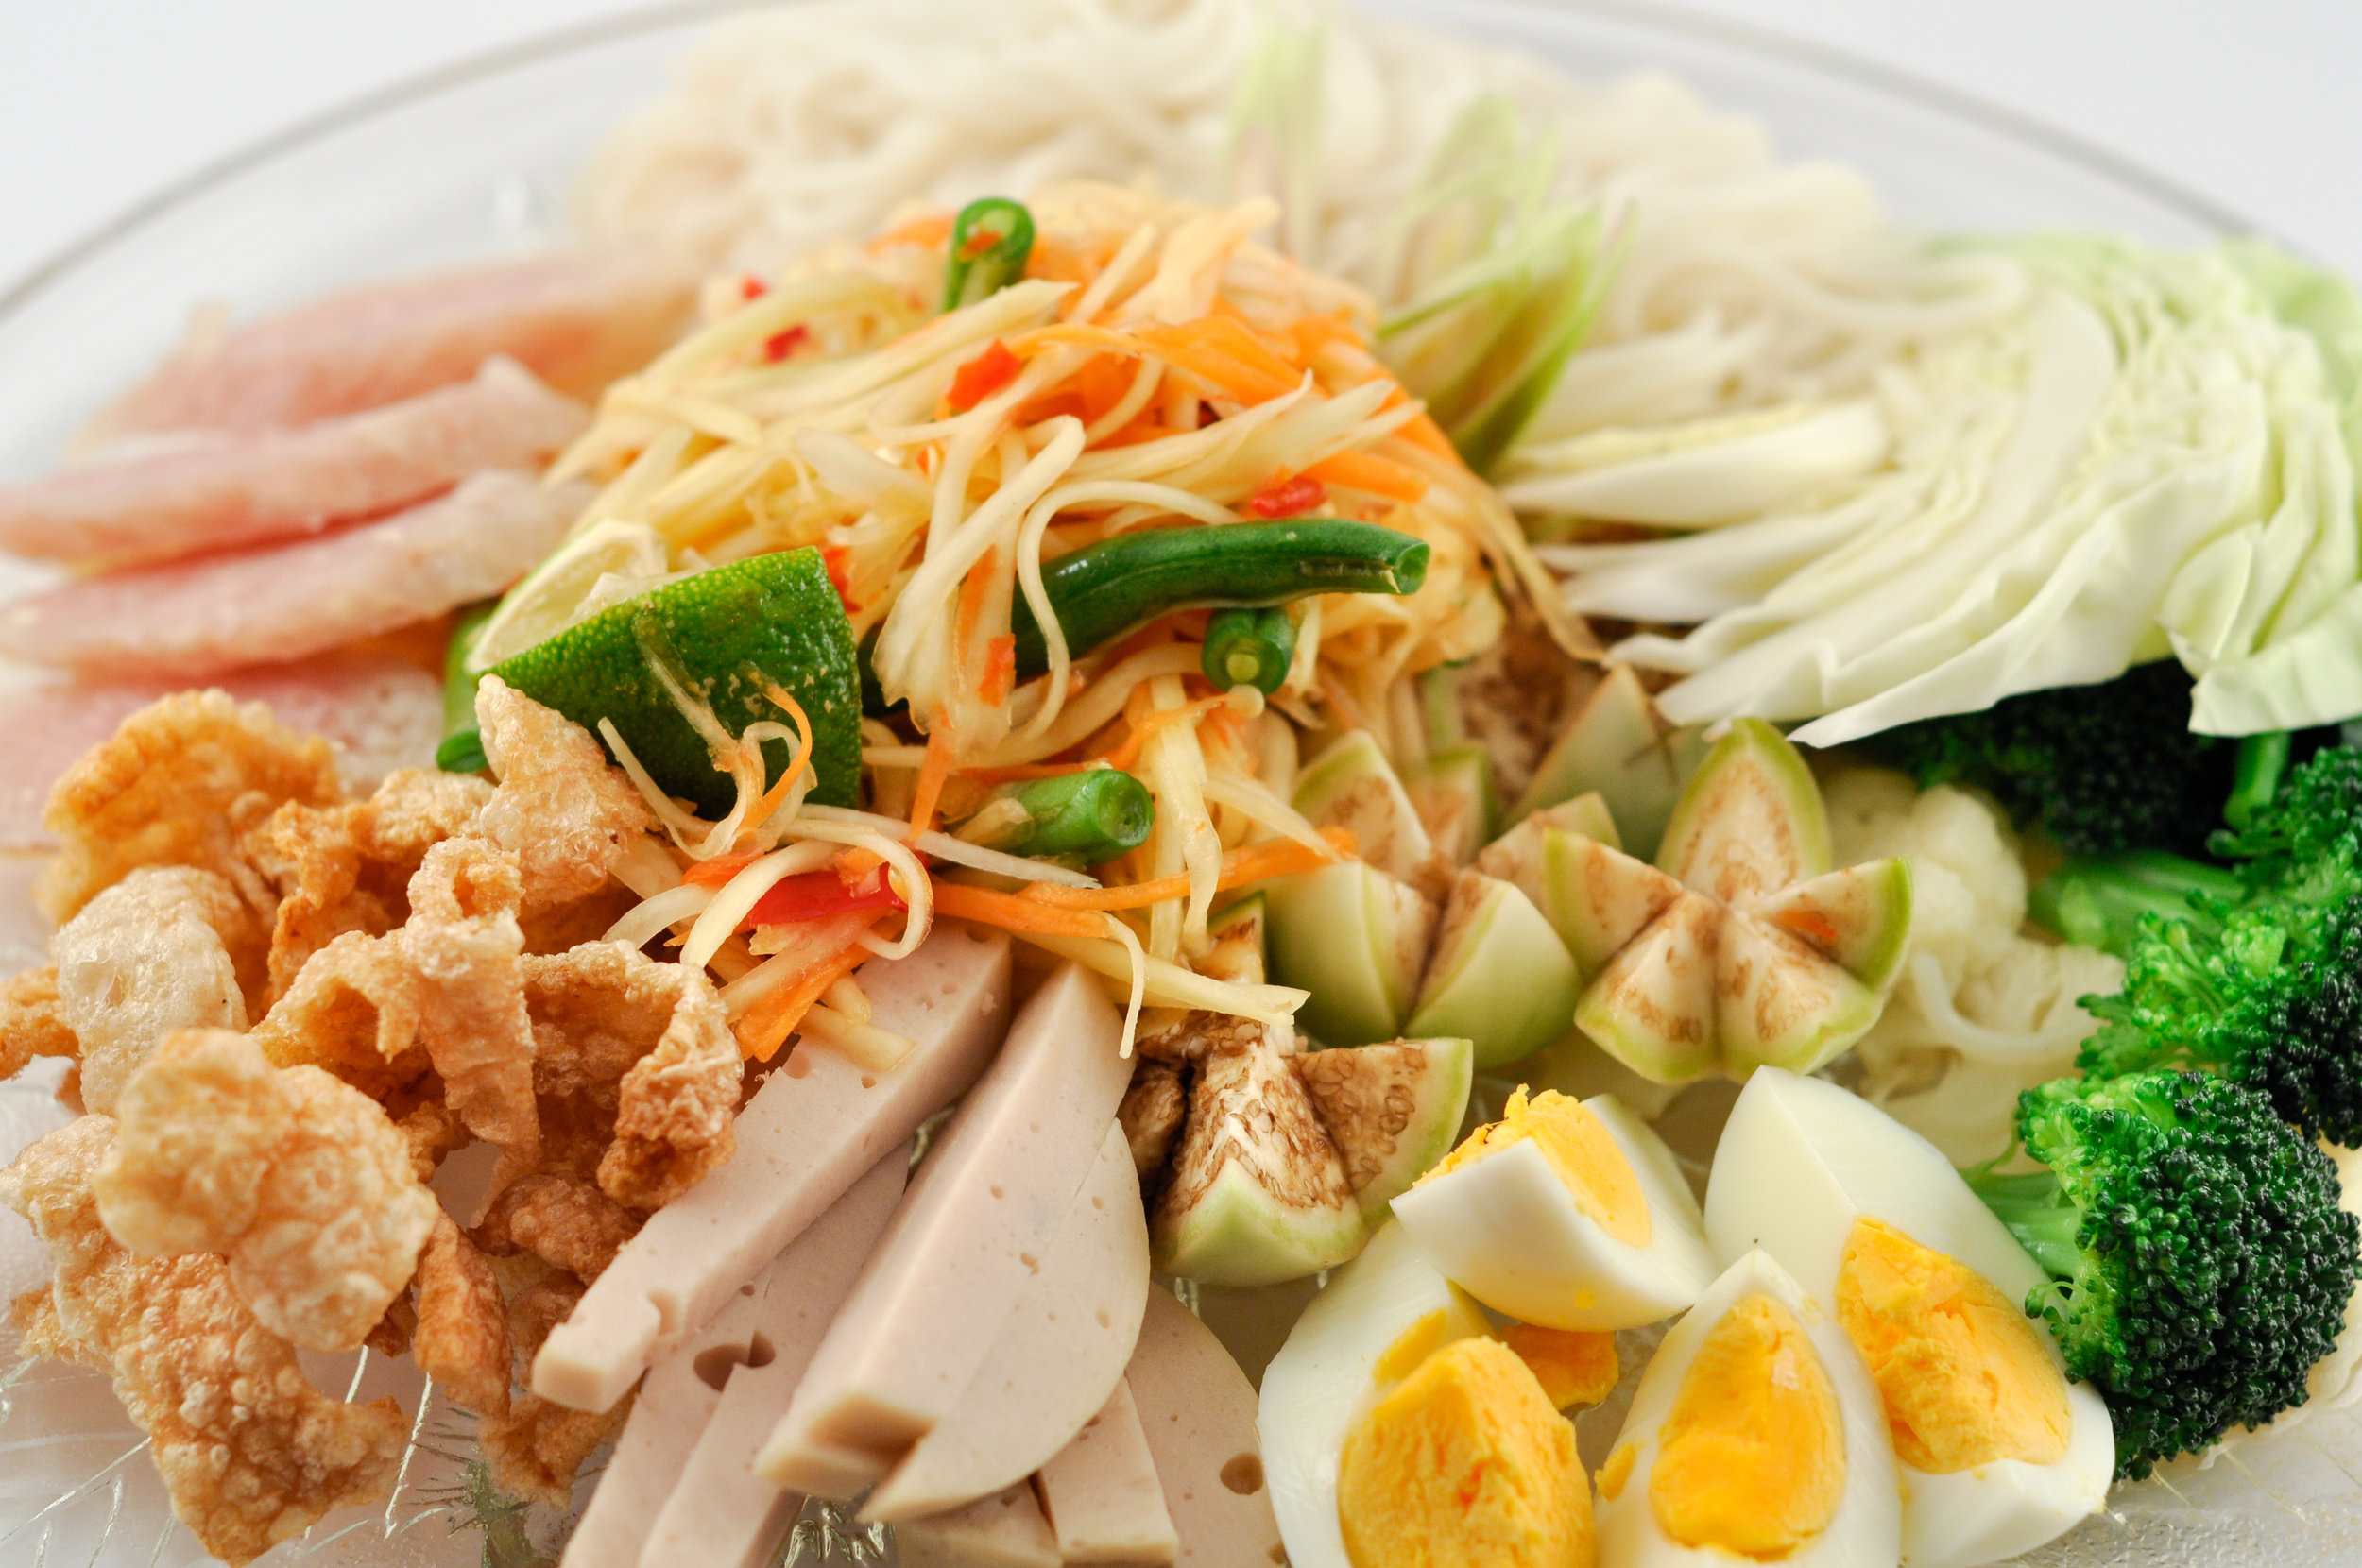 Tum Tardt - Papaya Salad with Condiments